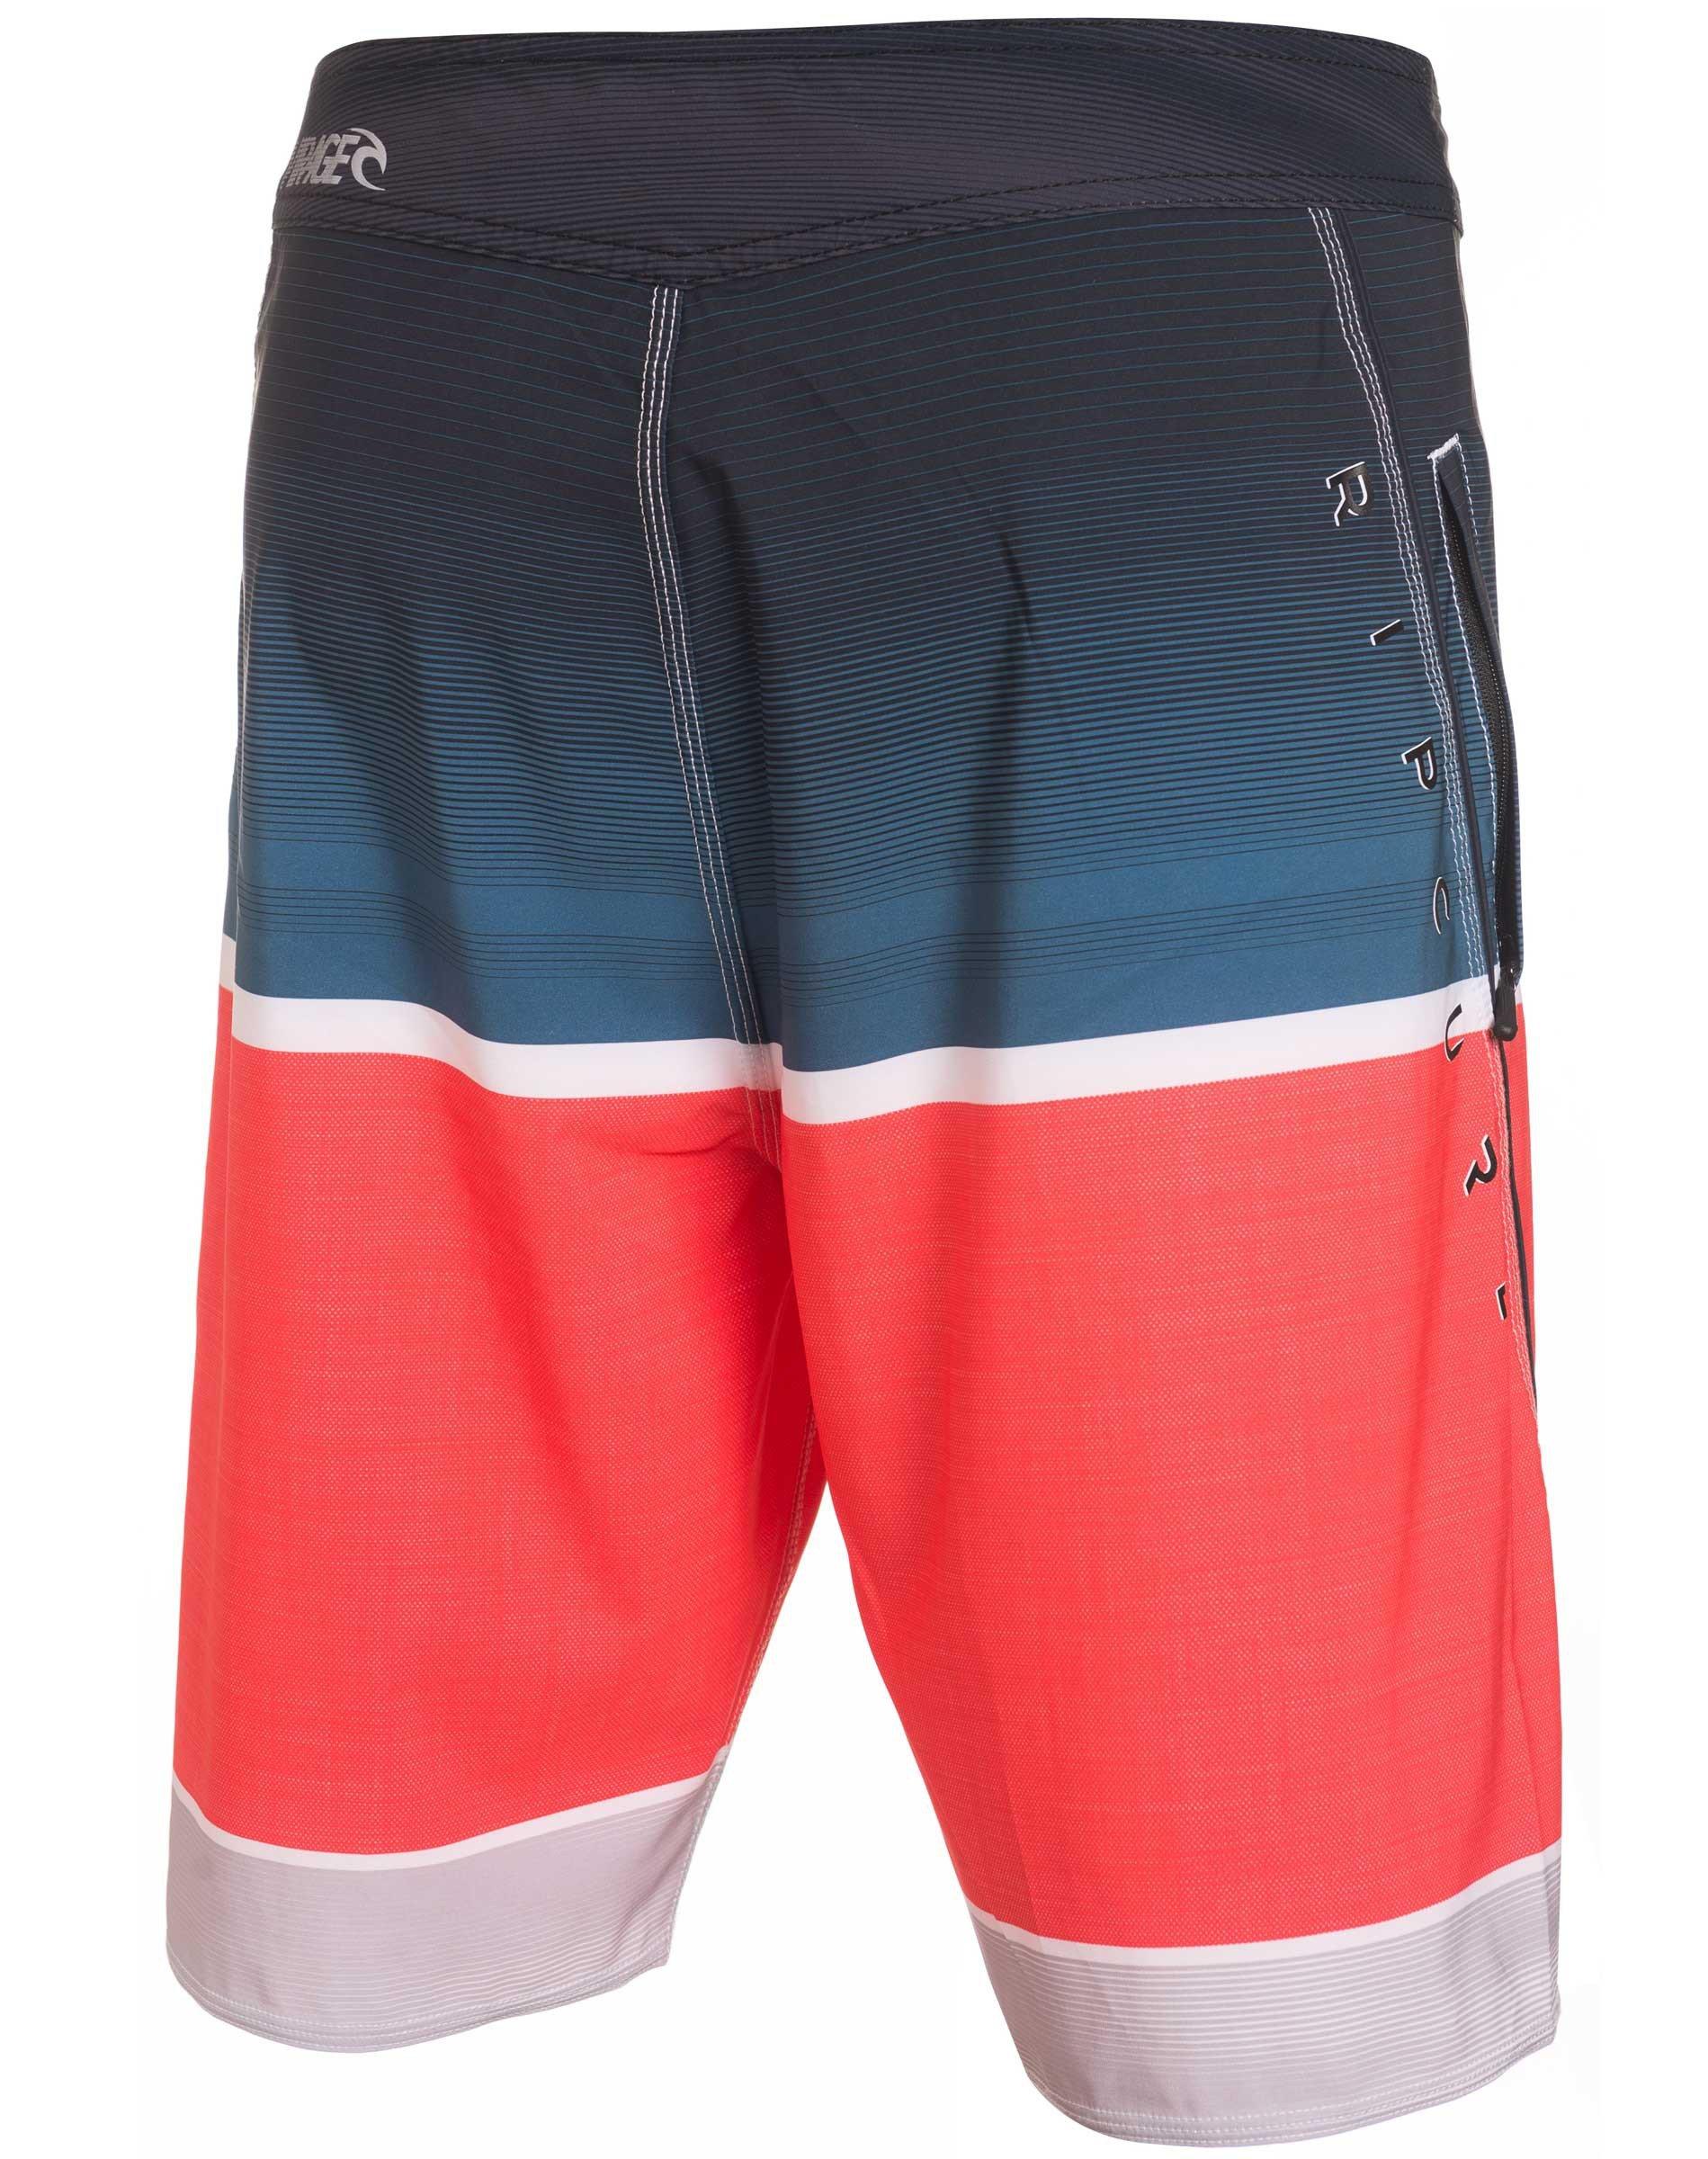 Boardshort bain maillot de bain Rip Curl Mirage Pigment Core Boardshort 2020 Dusty